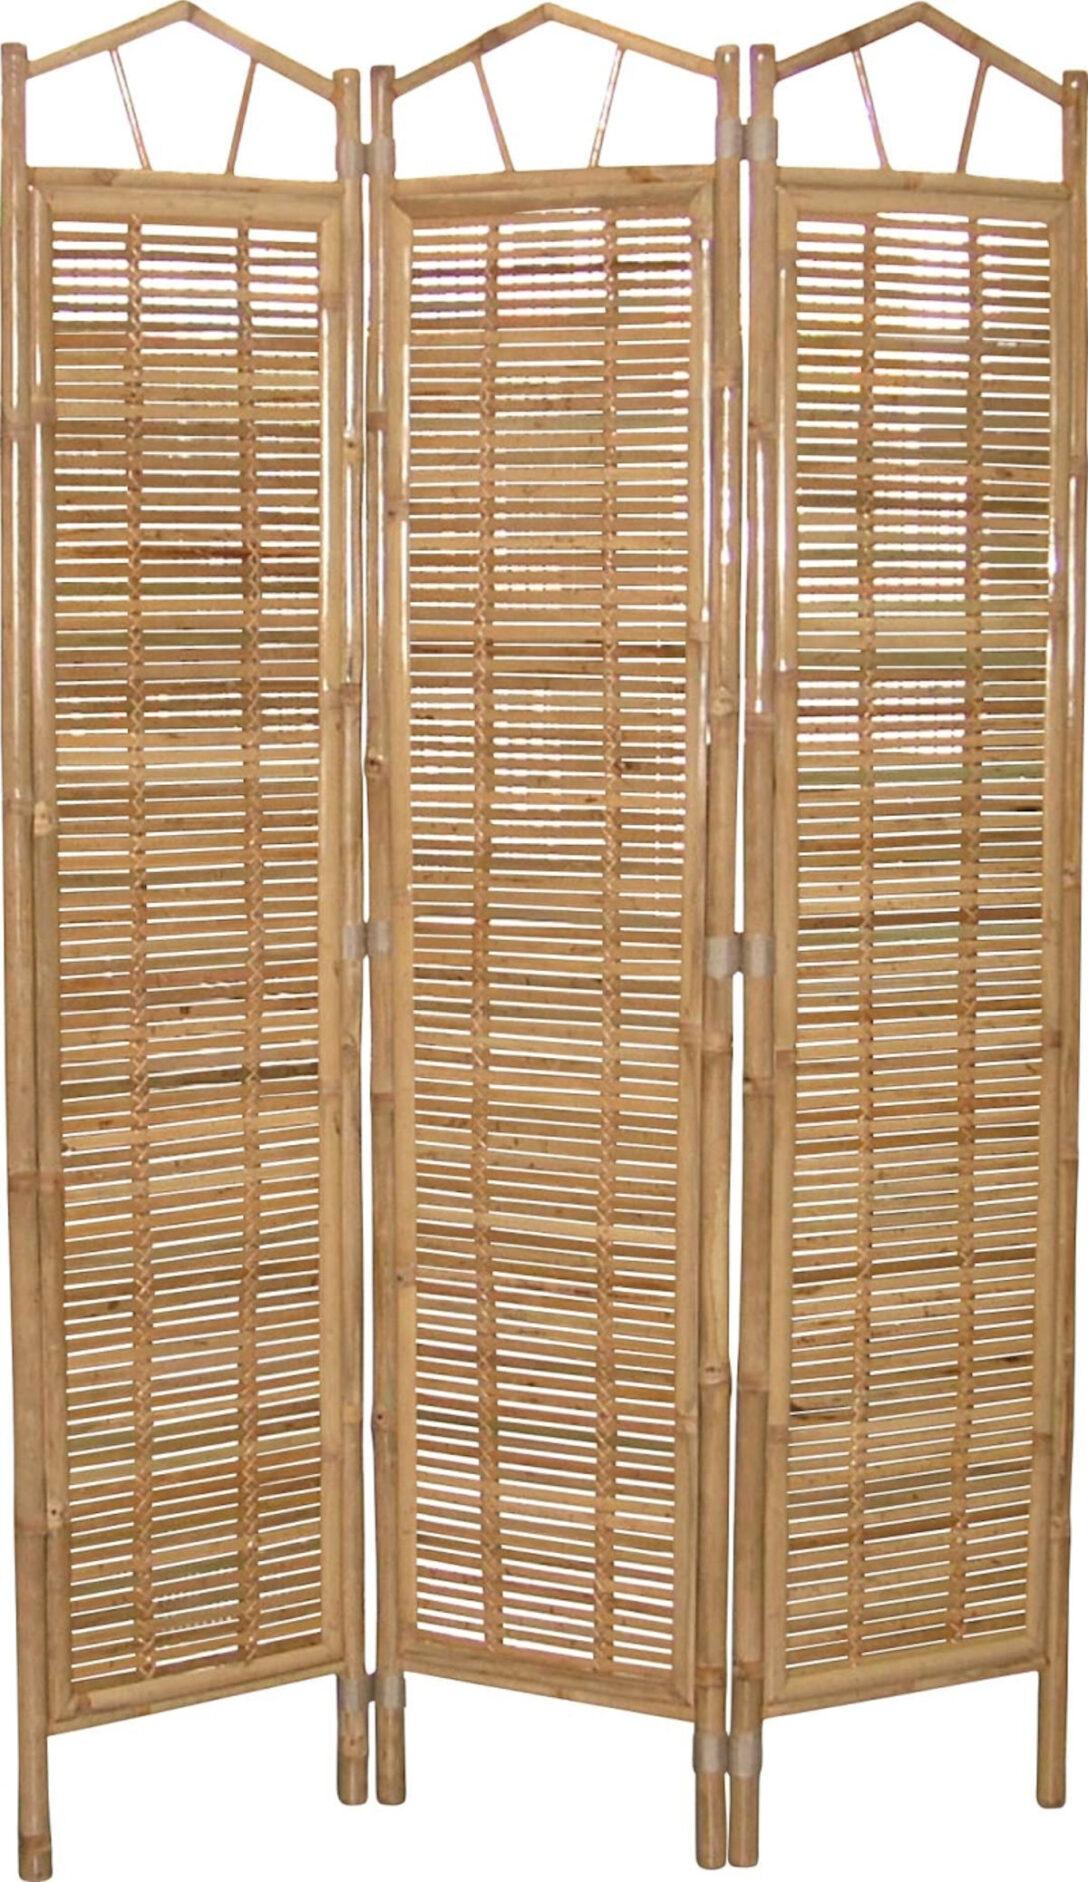 Large Size of Garten Paravent Bambus Bett Wohnzimmer Paravent Bambus